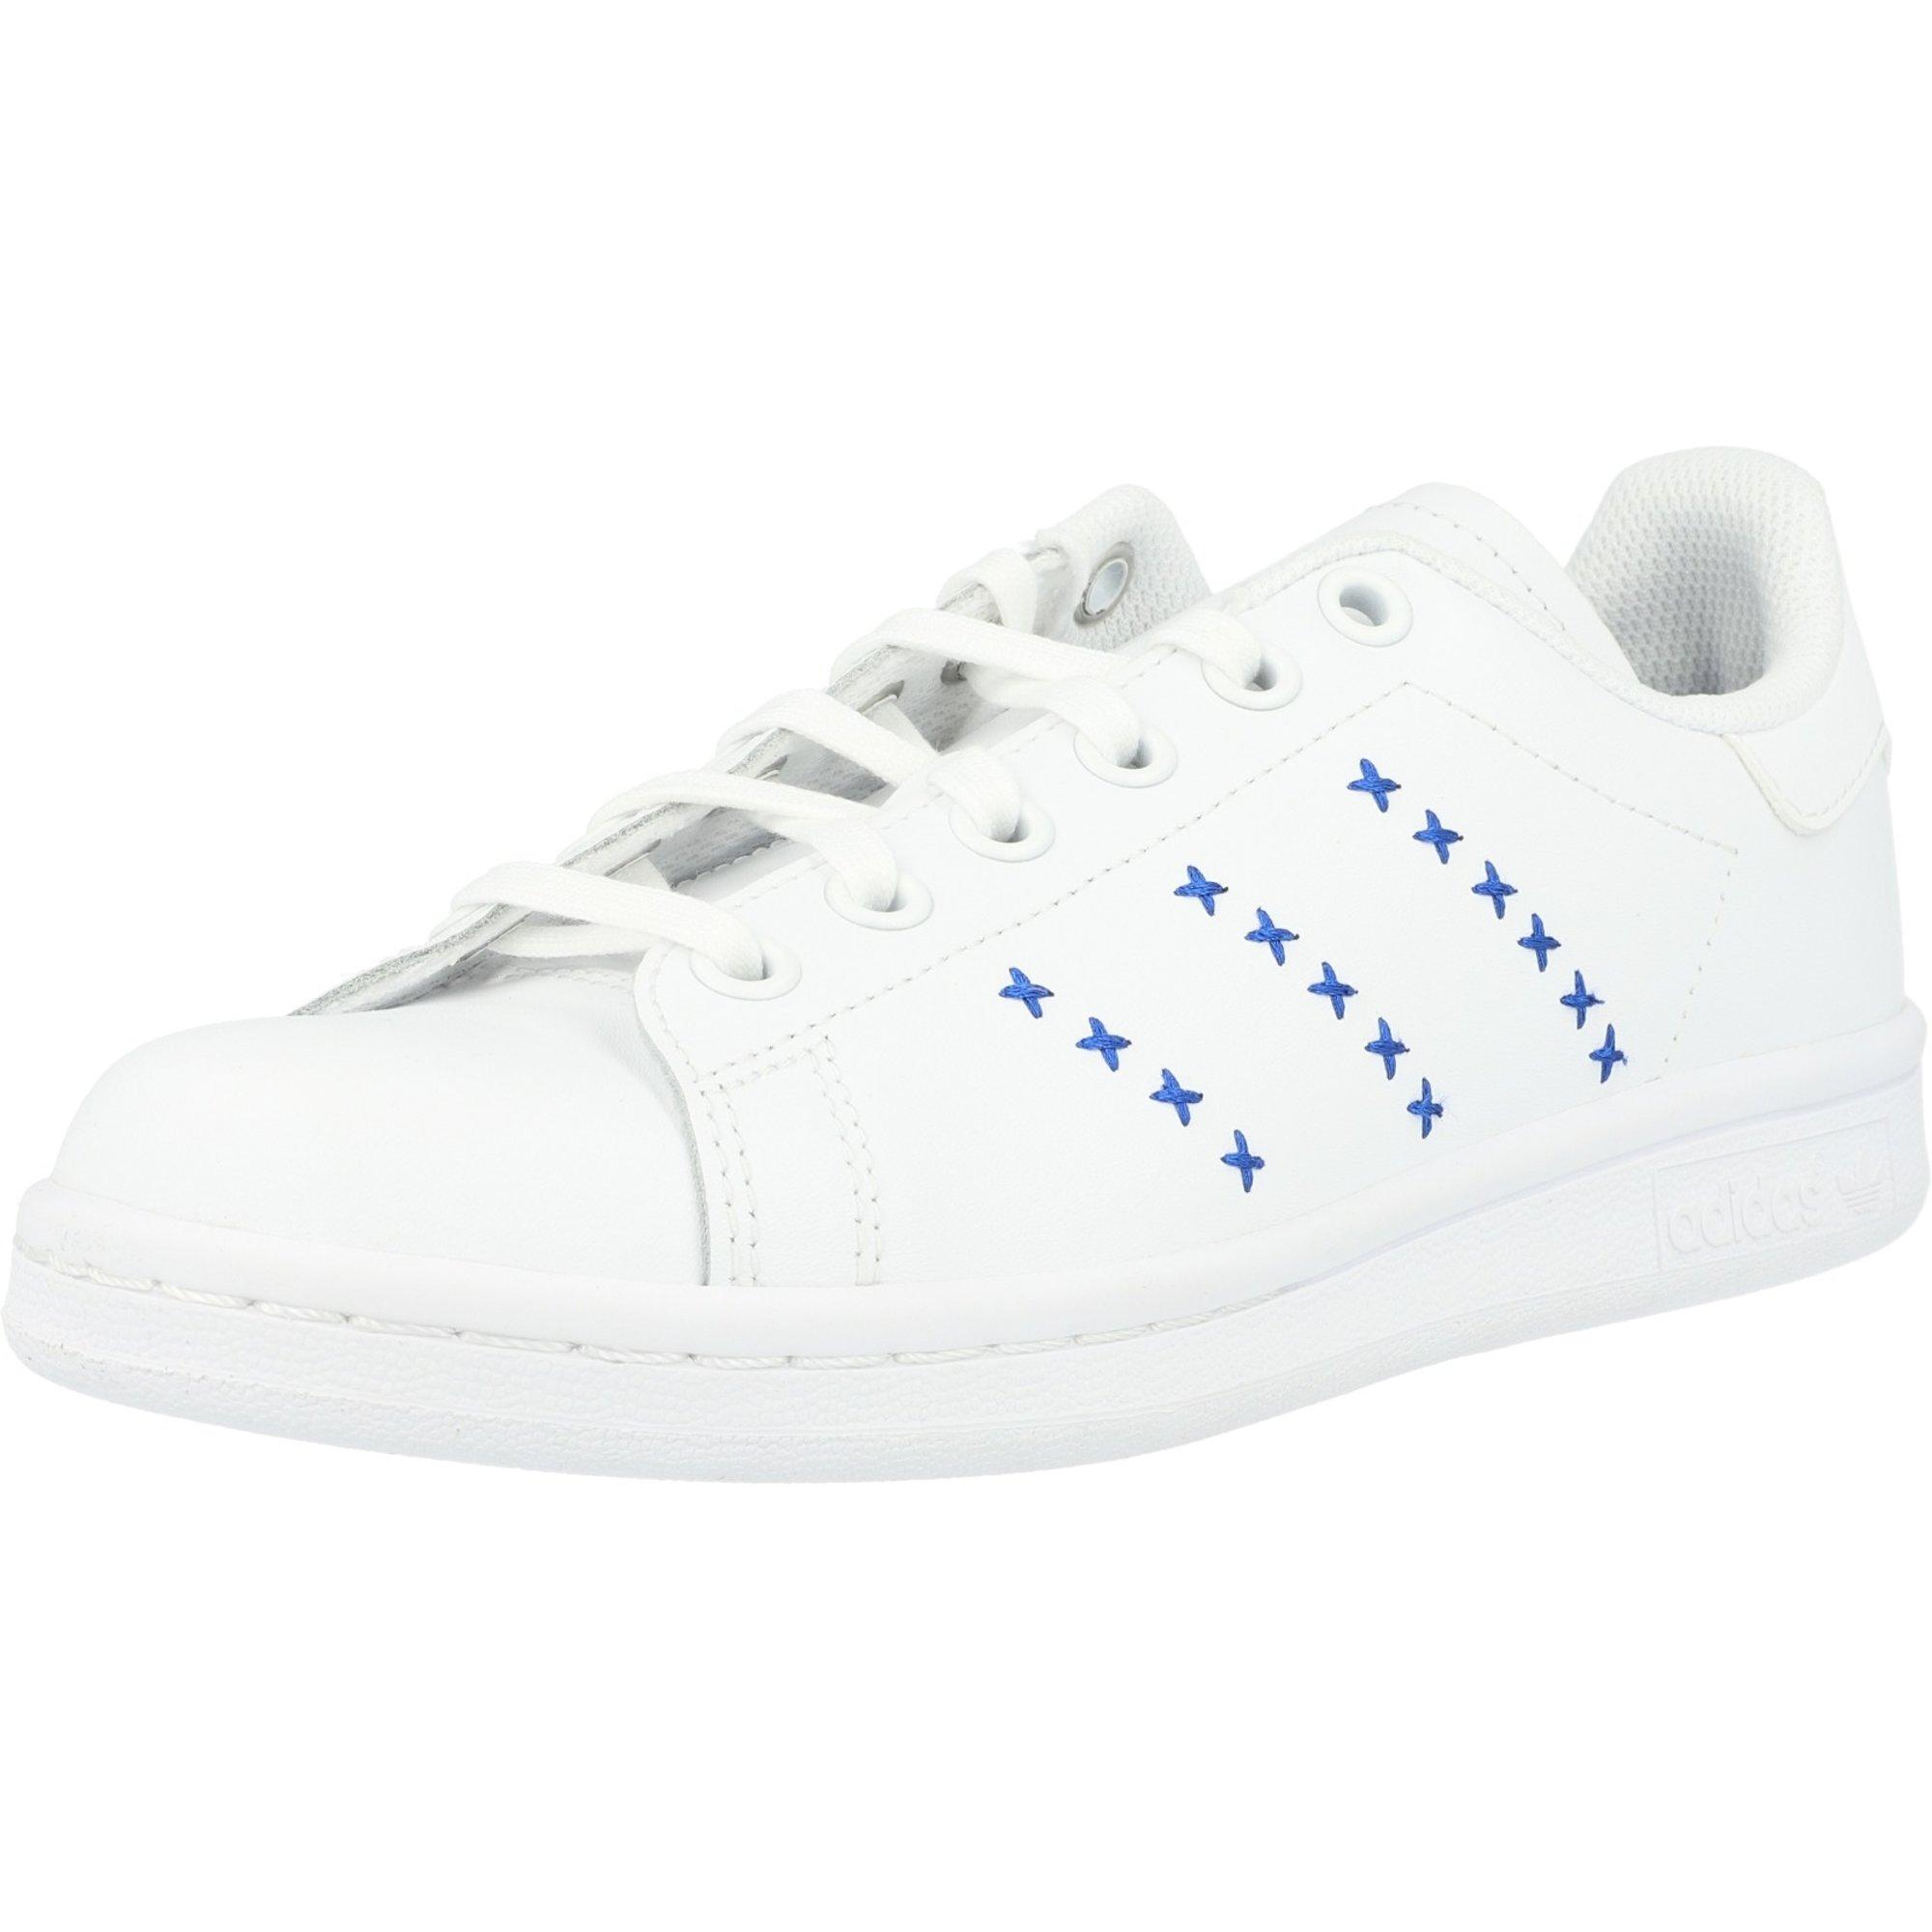 adidas Originals Stan Smith J White/Royal Blue Leather Junior